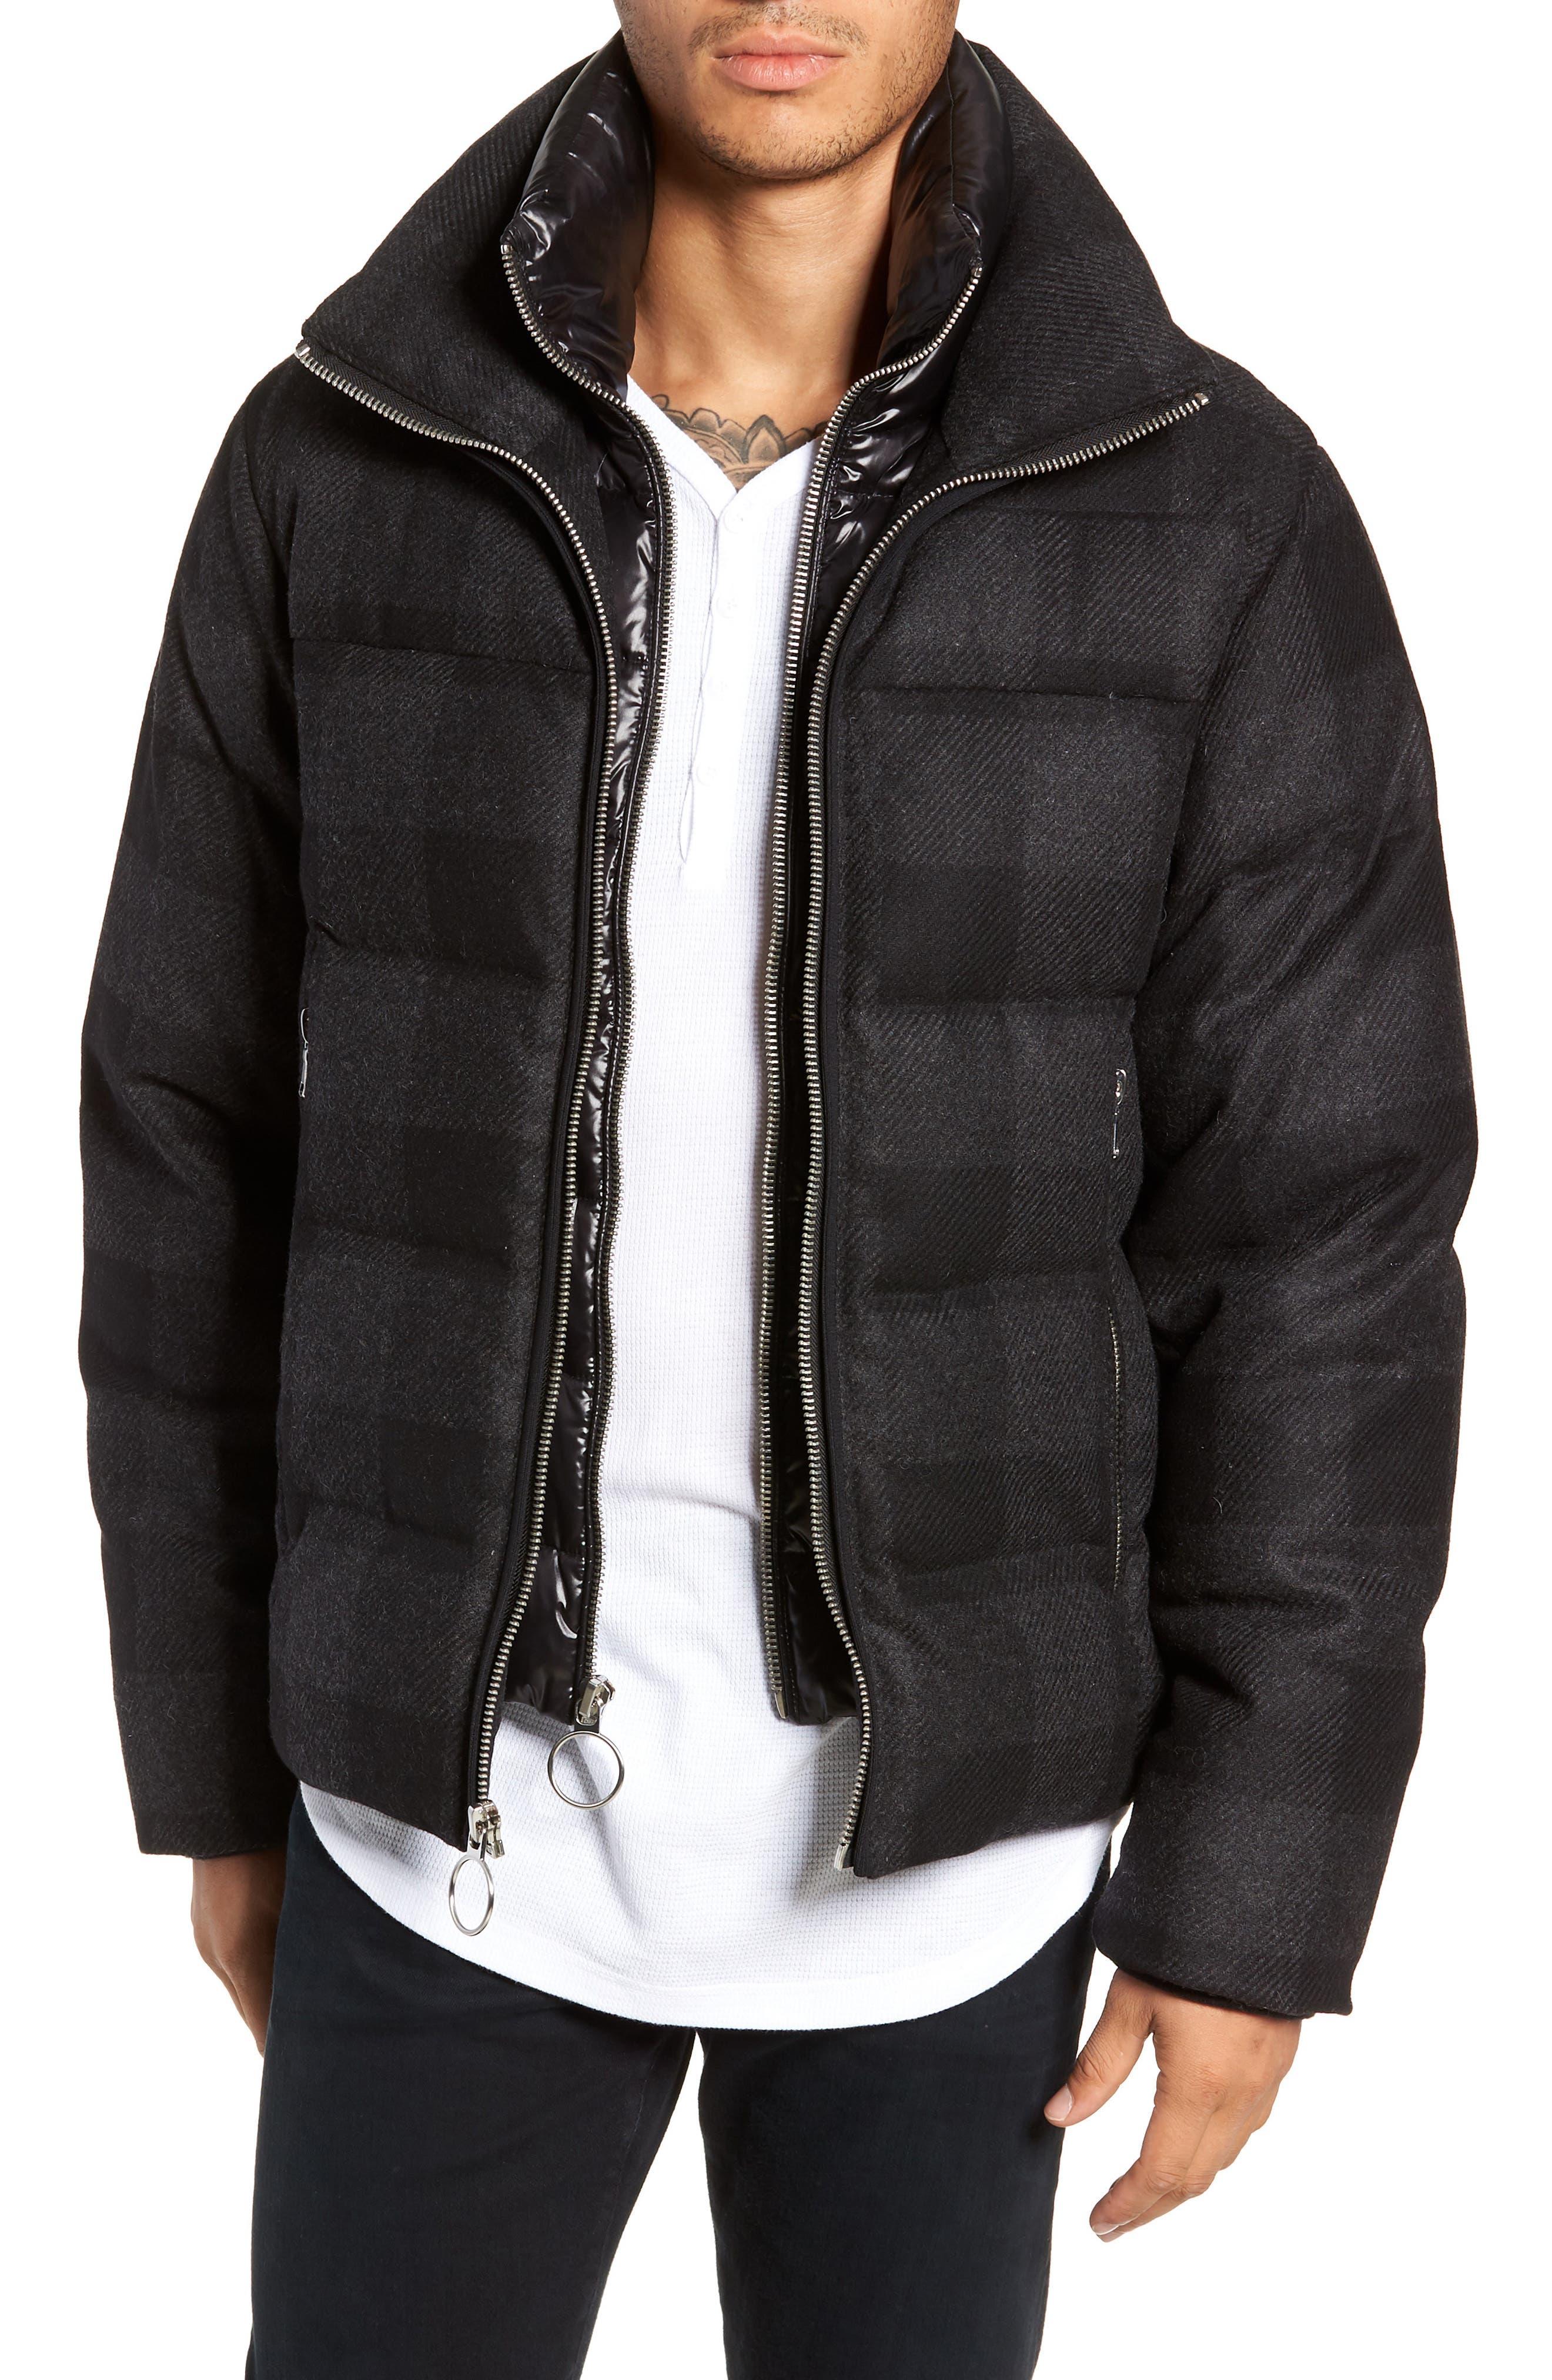 Crosby Plaid Wool Bib Puffer Jacket,                         Main,                         color, CHARCOAL/ BLACK PLAID